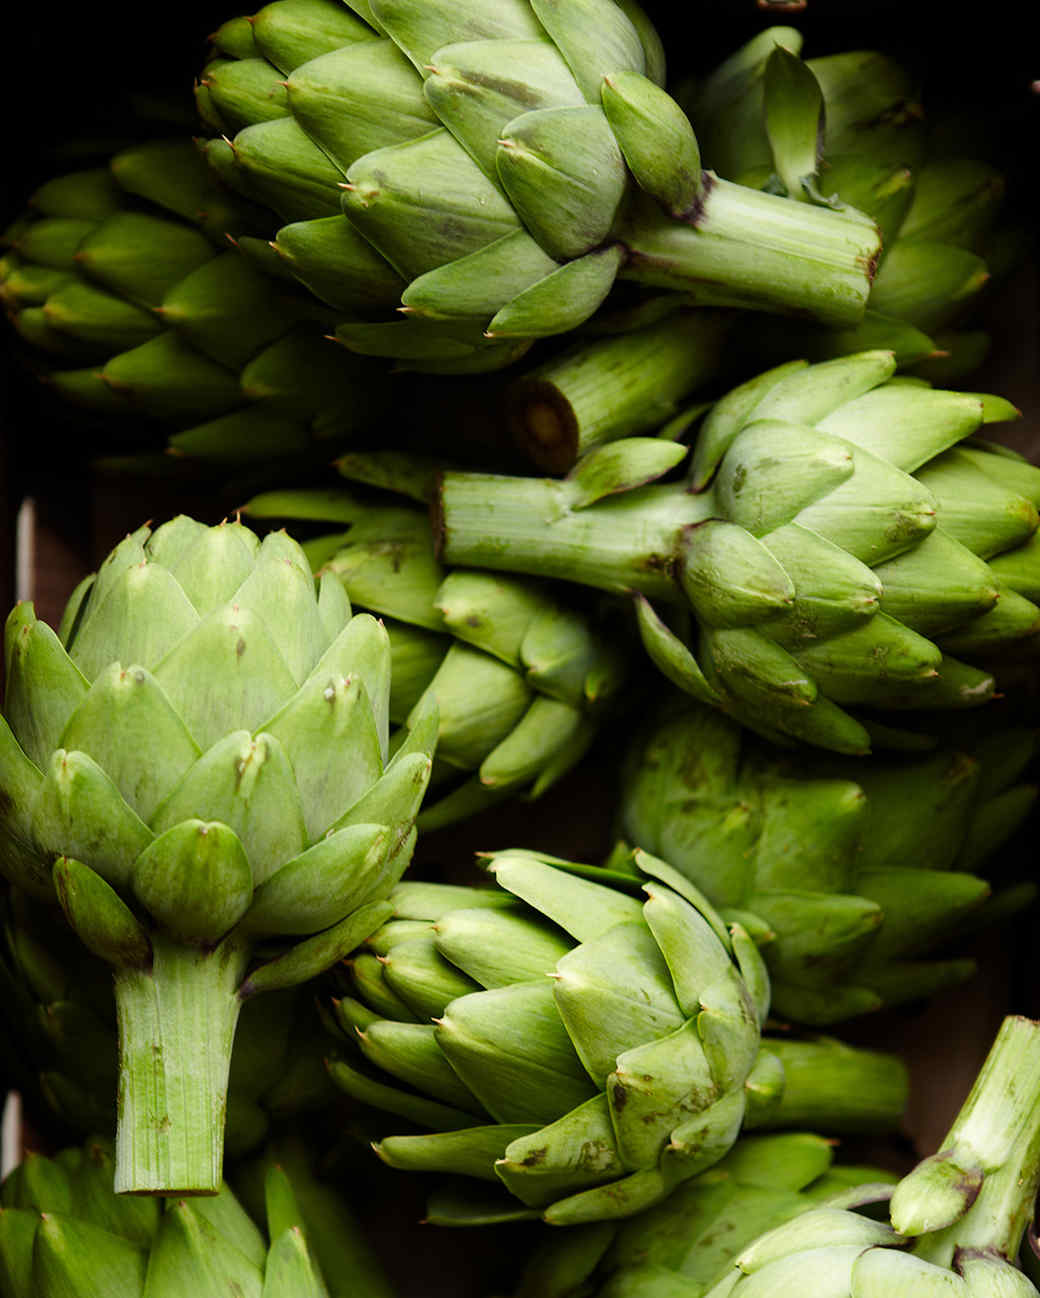 Asparagus Recipes: 25 Ways To Cook Our Favorite Spring Veg